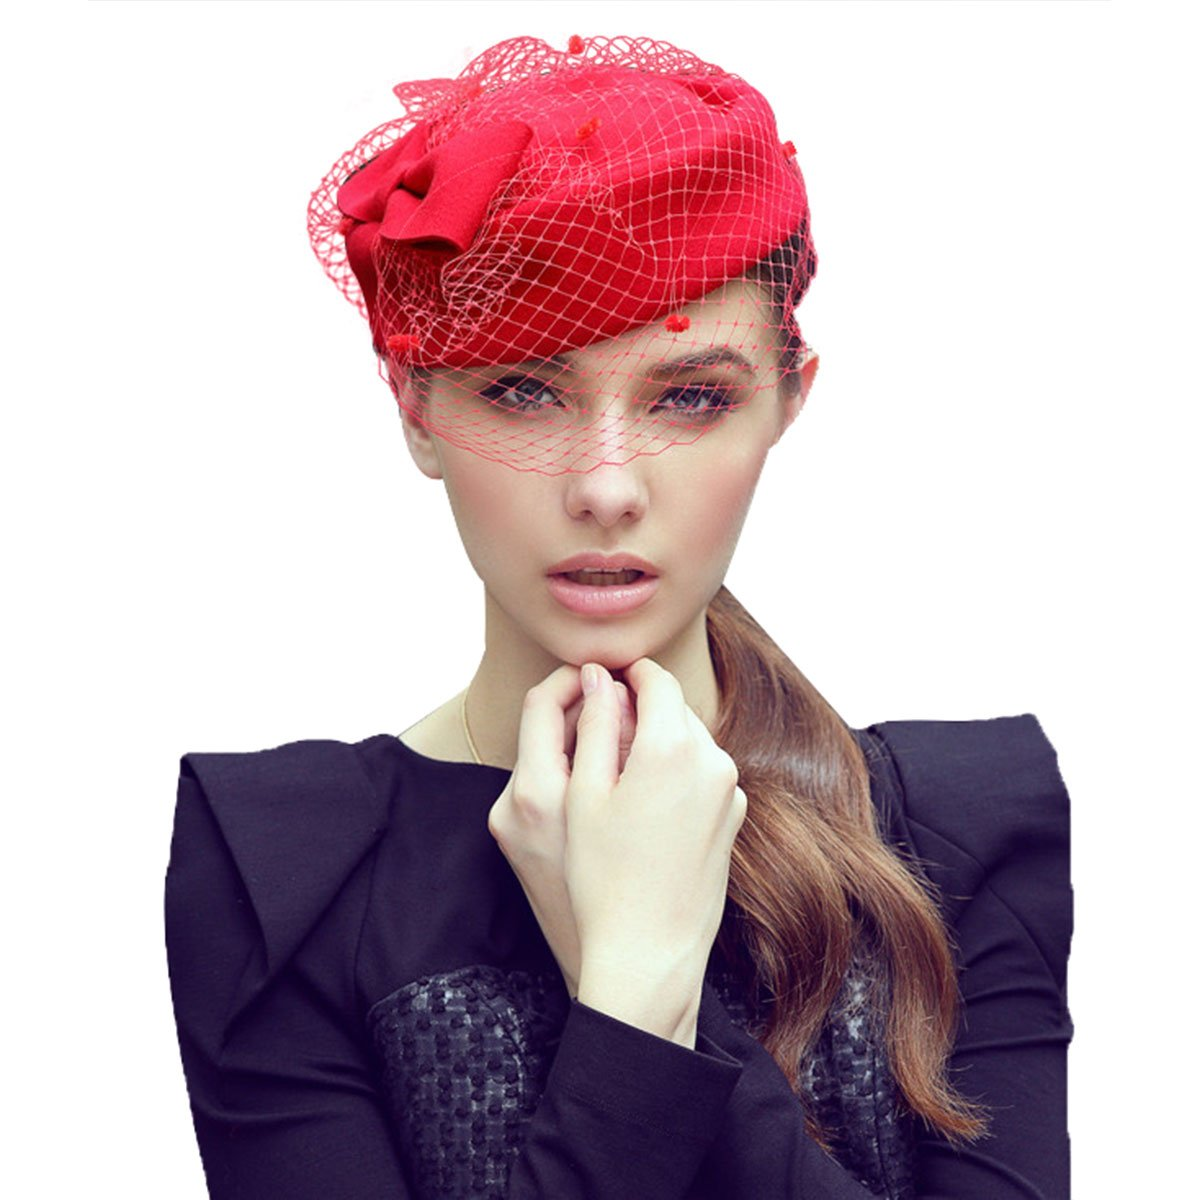 Womens Dress Fascinator Wool Felt Pillbox Hat Party Wedding Bow Veil A080 A080black